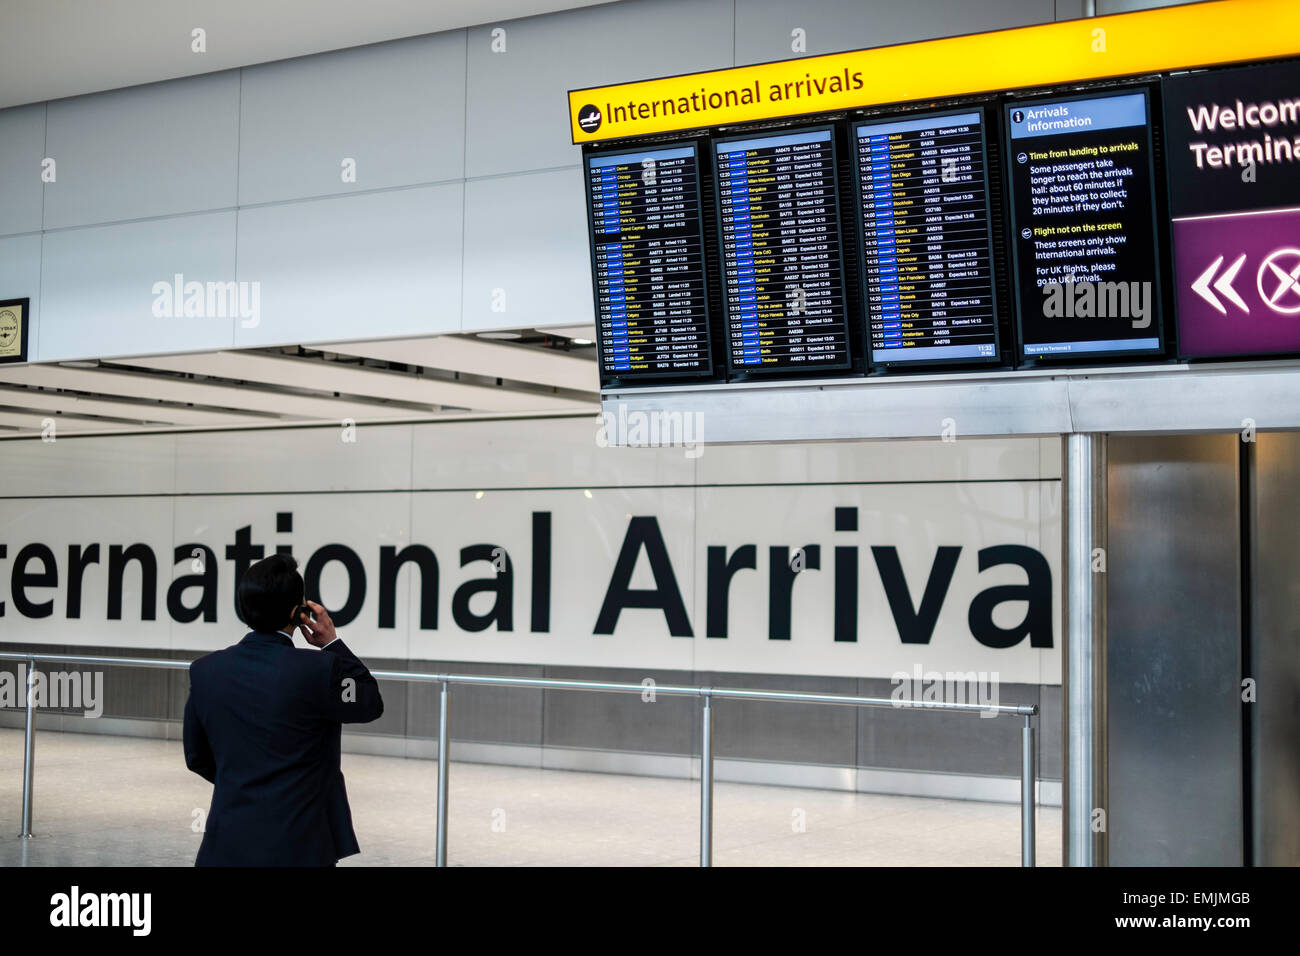 Arrivals Hall, terminal 5, Heathrow airport, London, United Kingdom - Stock Image